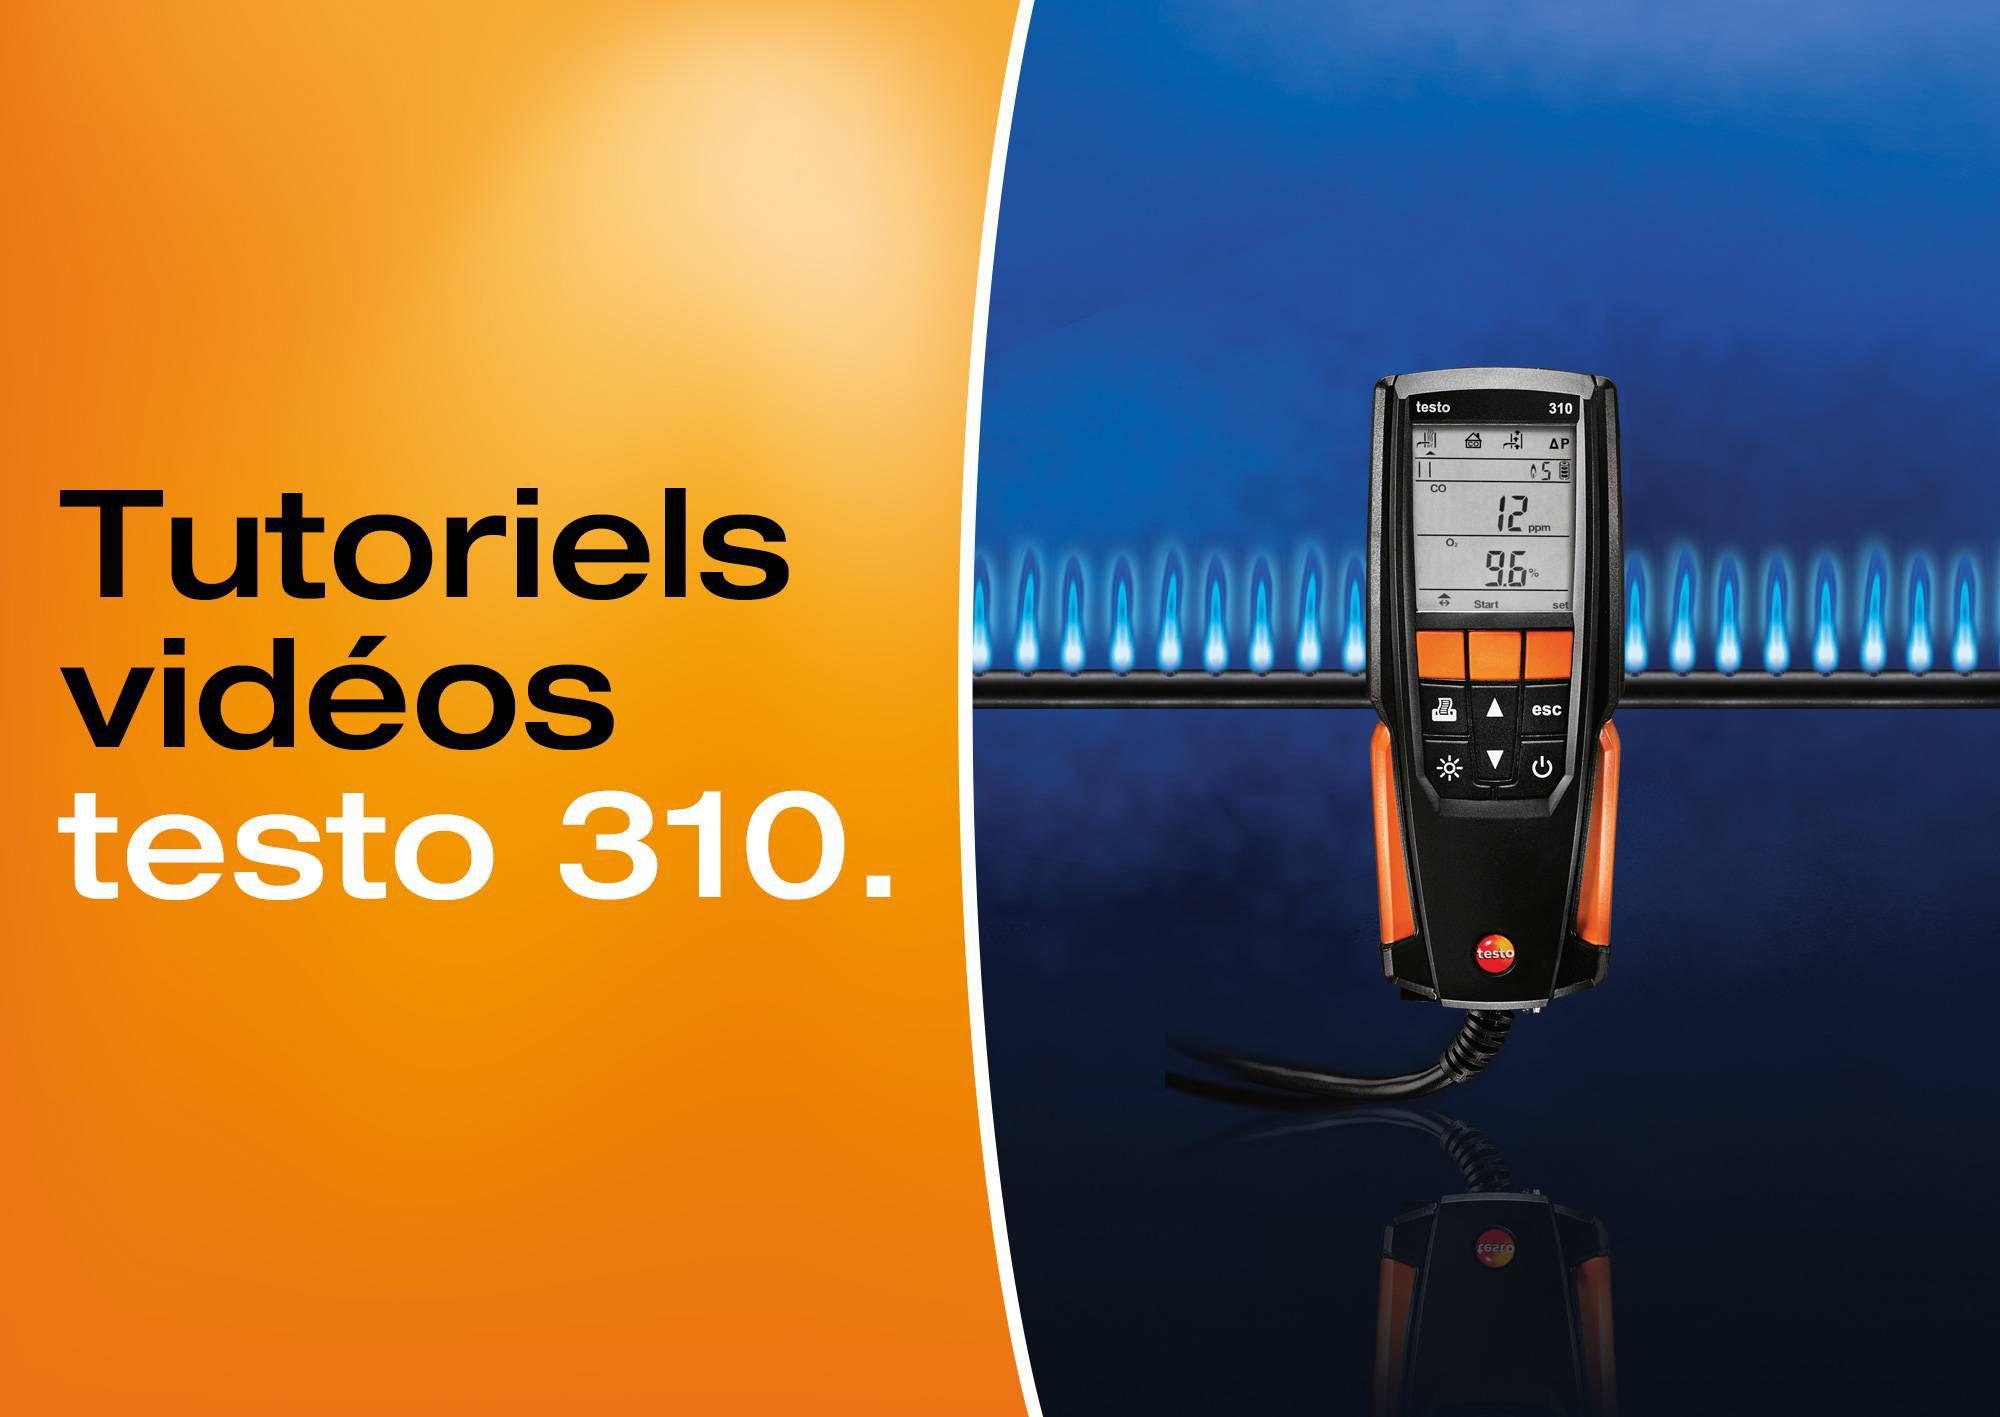 tutoriels-vidéos-analyseur-testo-310